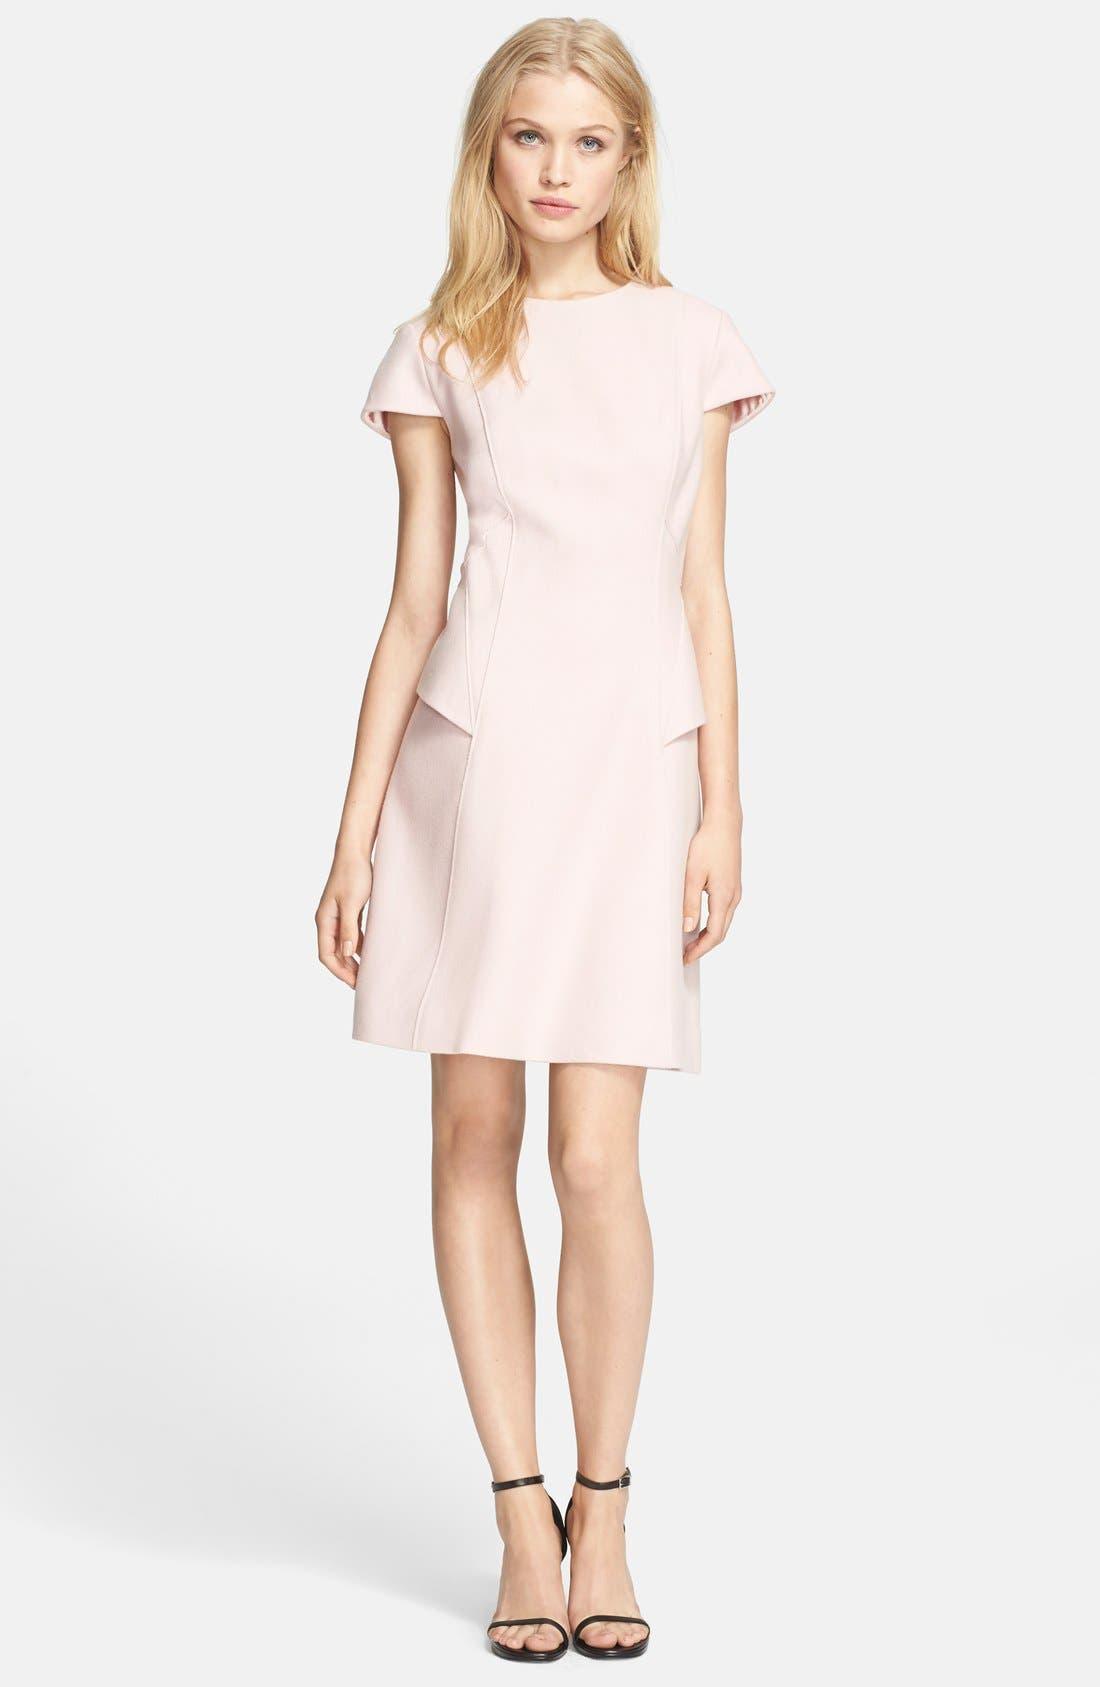 Main Image - Ted Baker London 'Coralen' Structured Wool Blend Sheath Dress